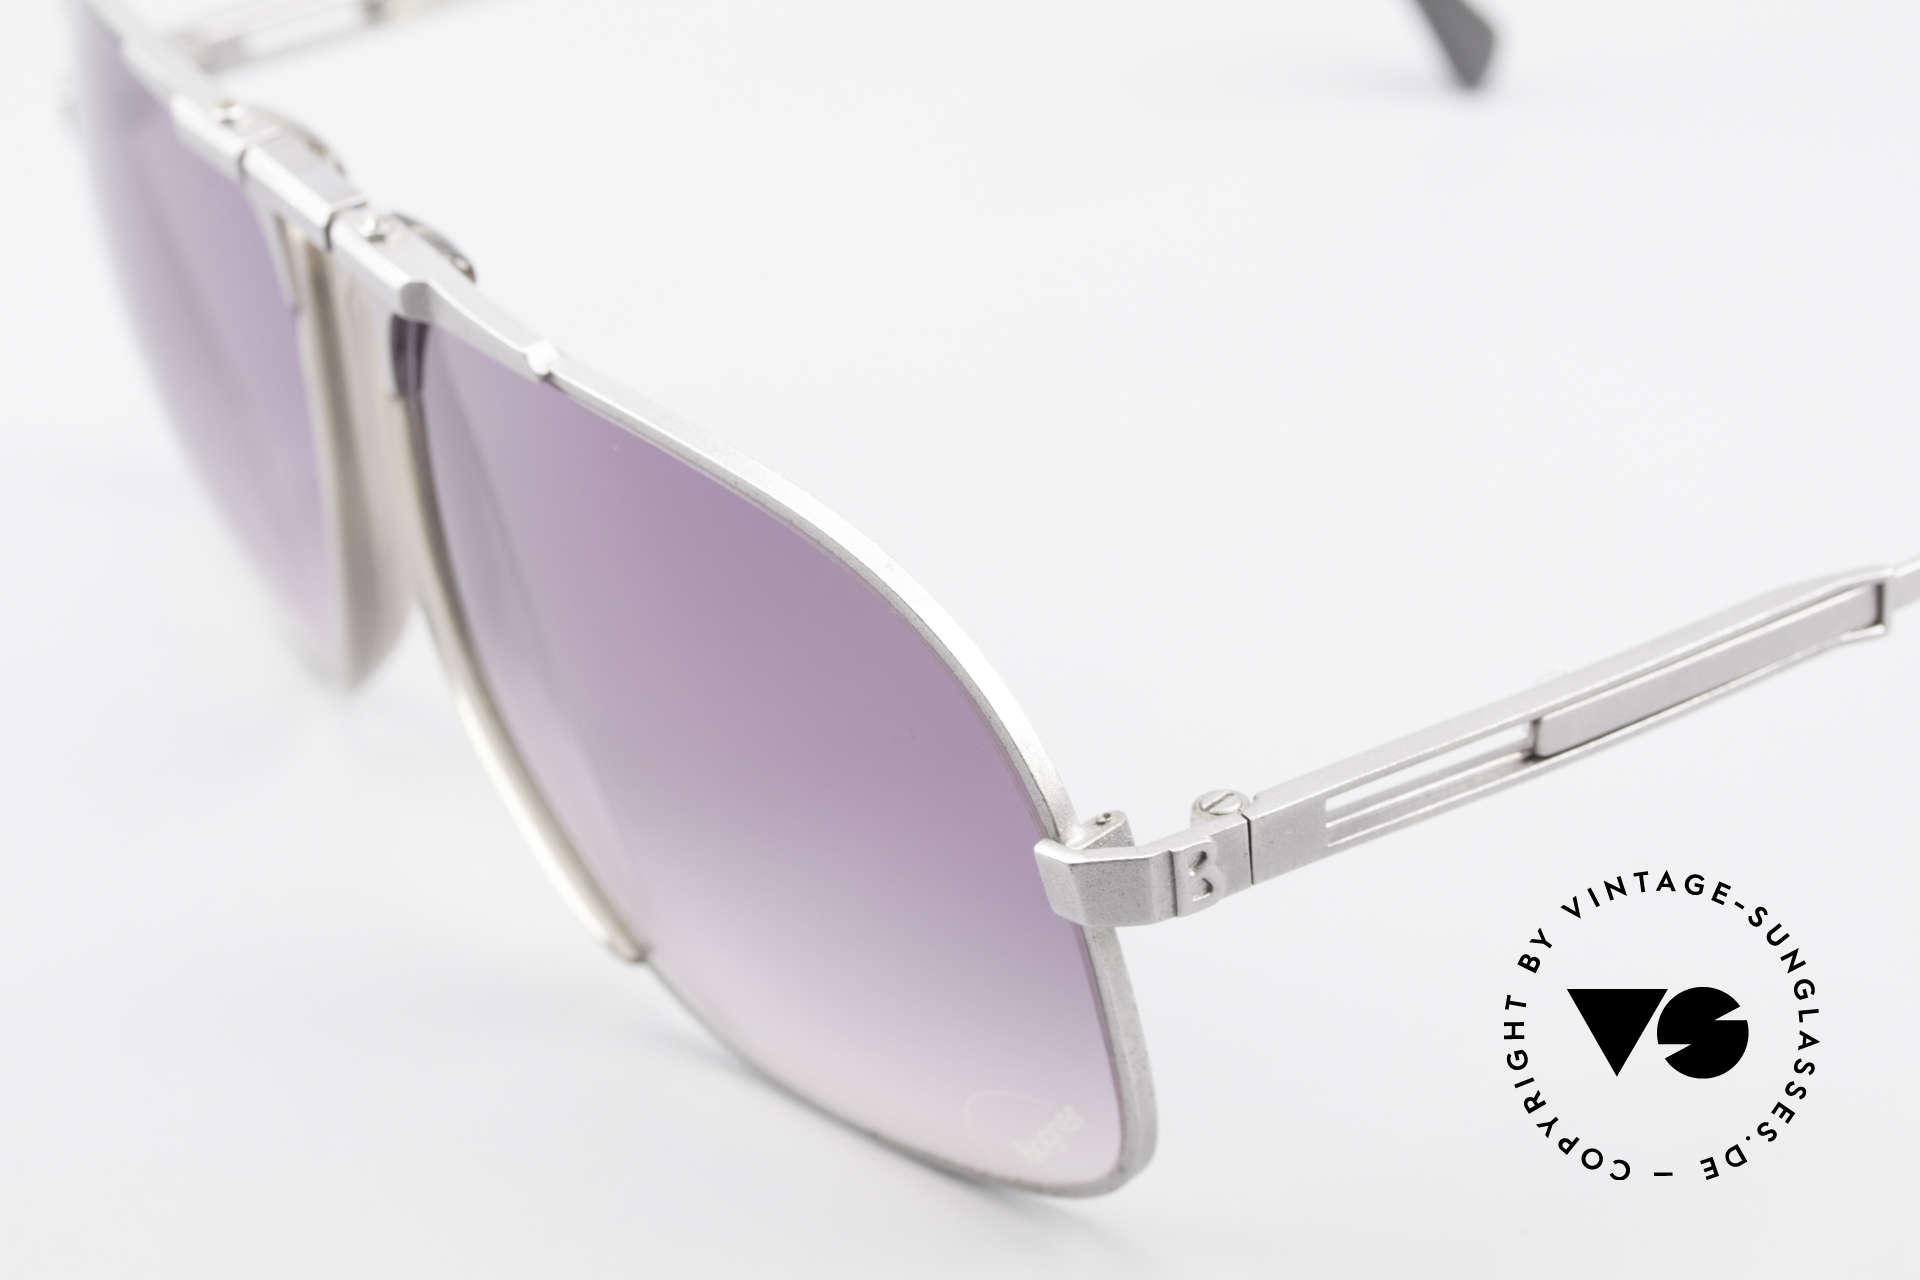 Willy Bogner 7023 Adjustable Sunglasses 80's, 7023 = similar to the James Bond Bogner shades '7003', Made for Men